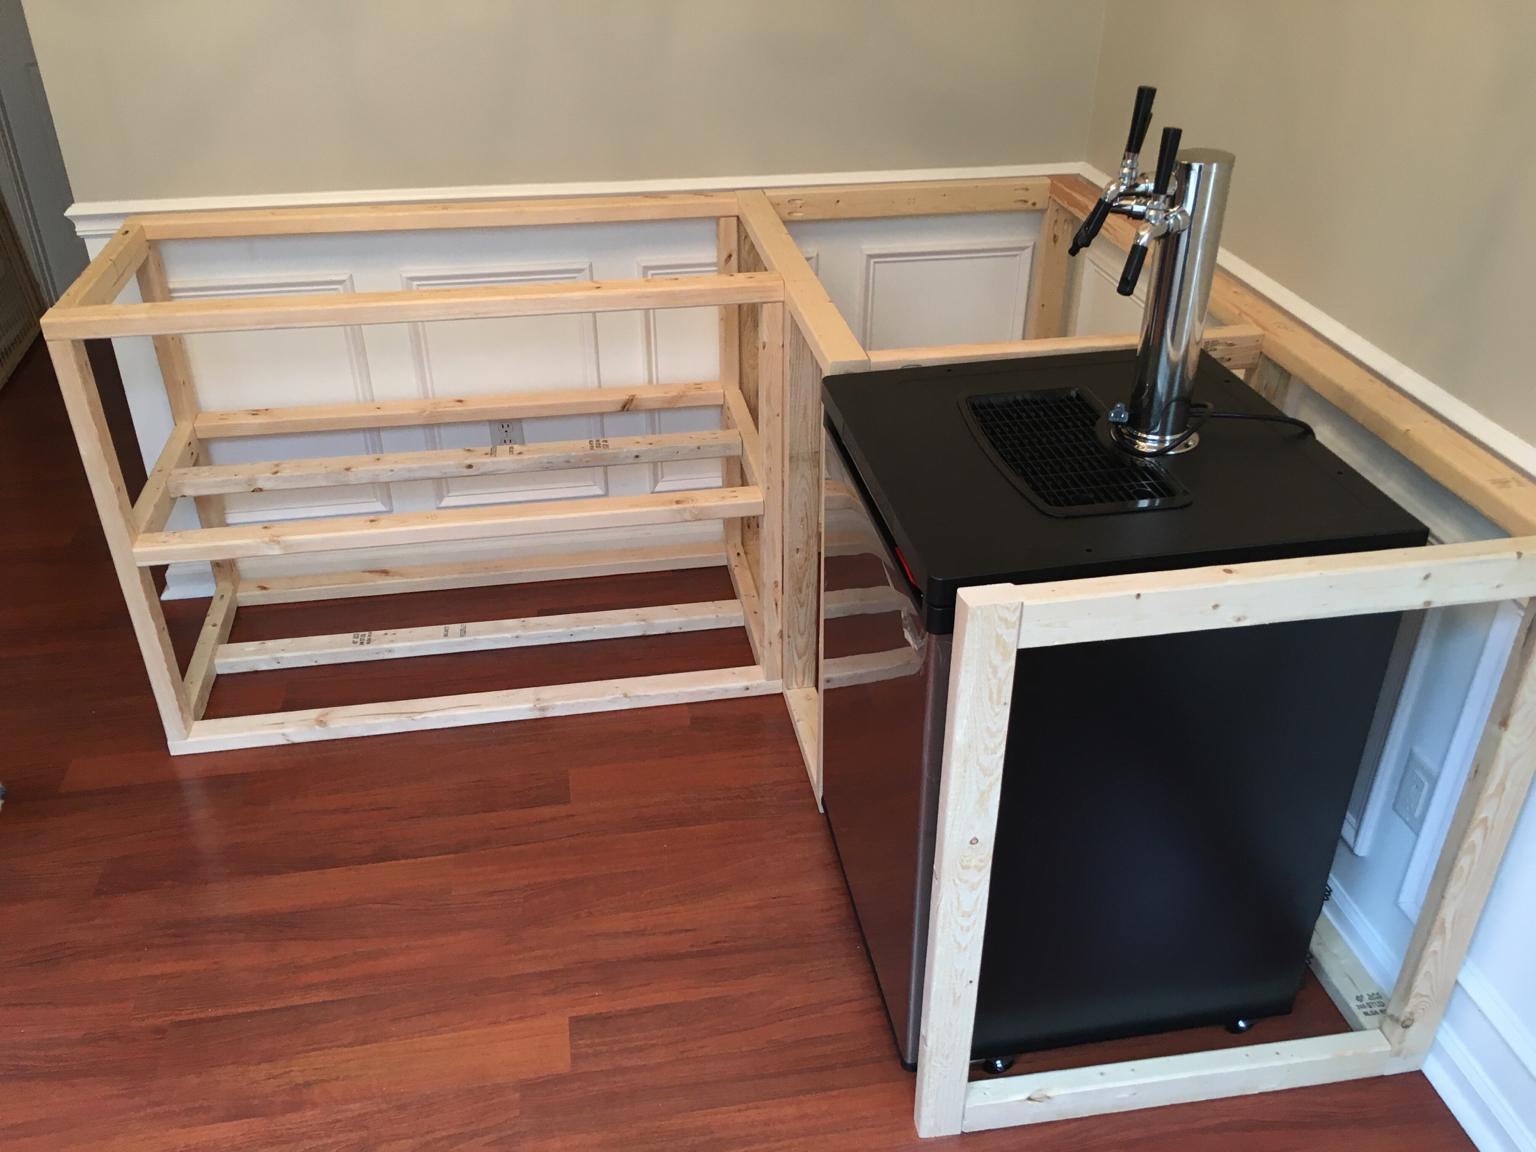 Home Bar Build with Kegerator | HomeBrewTalk.com - Beer, Wine, Mead ...